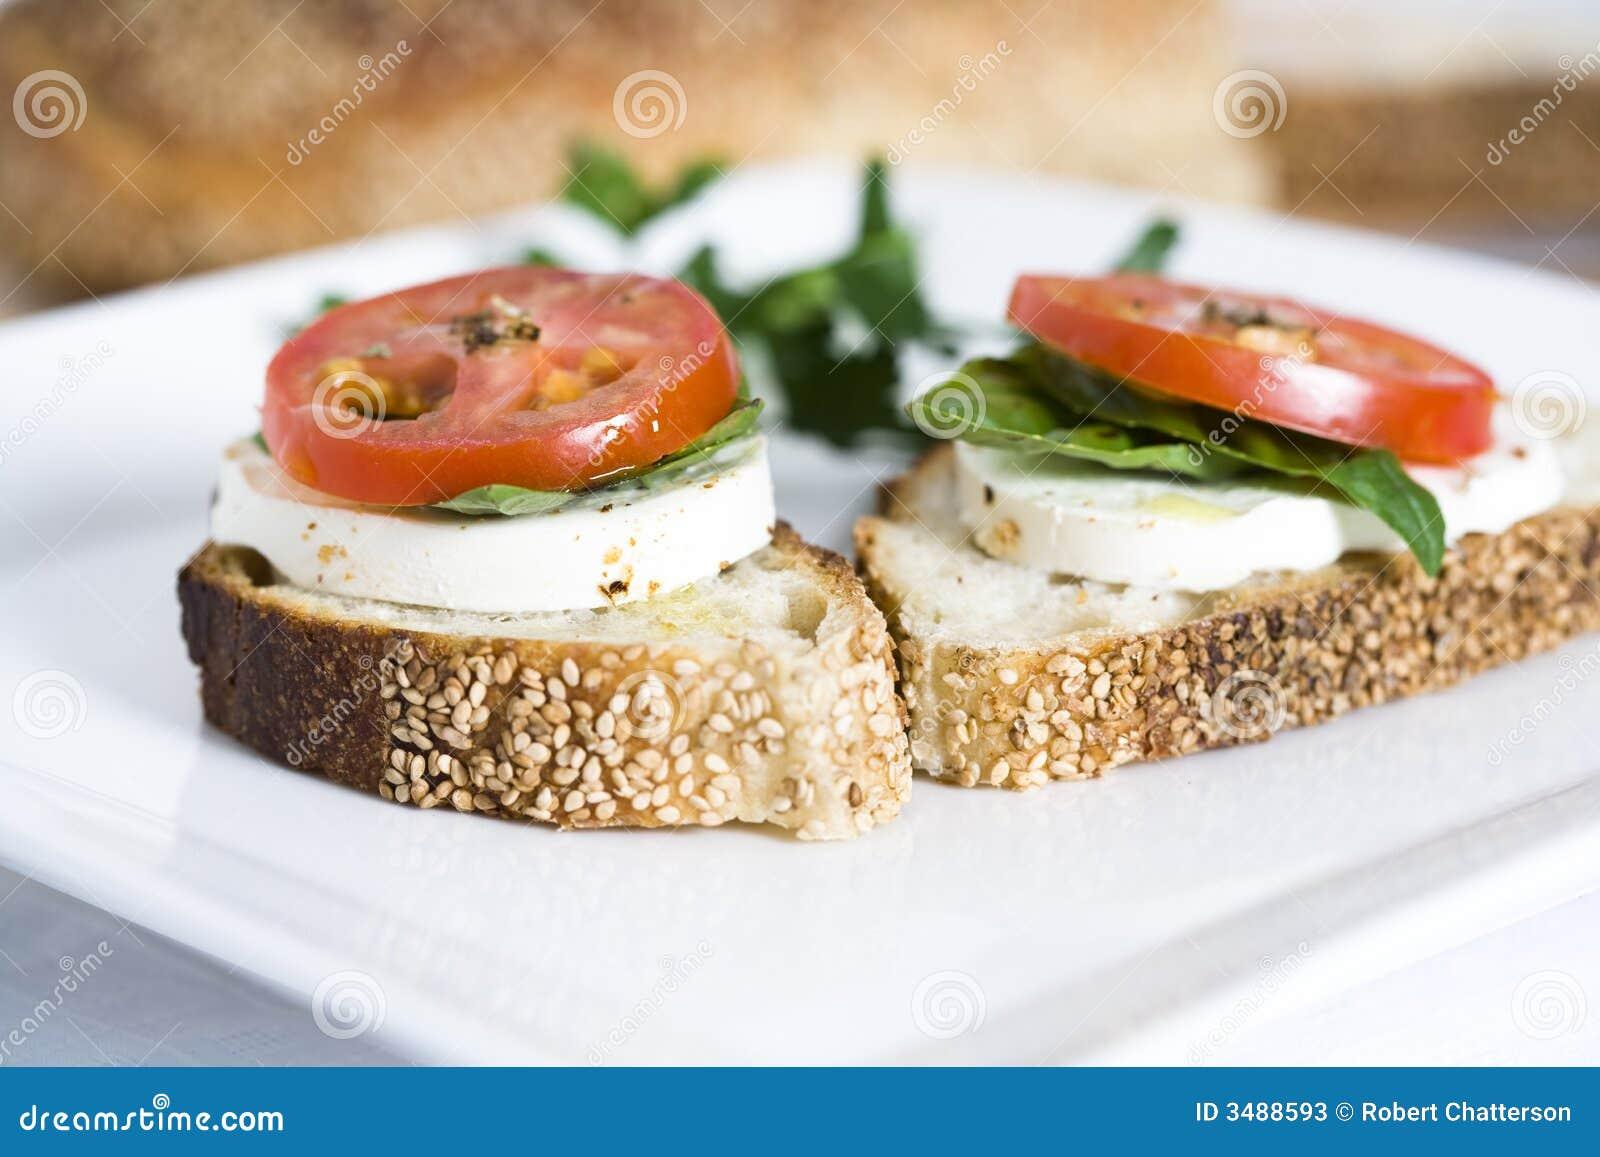 Tomato And Mozzarella On Bread Stock Photos - Image: 3488593